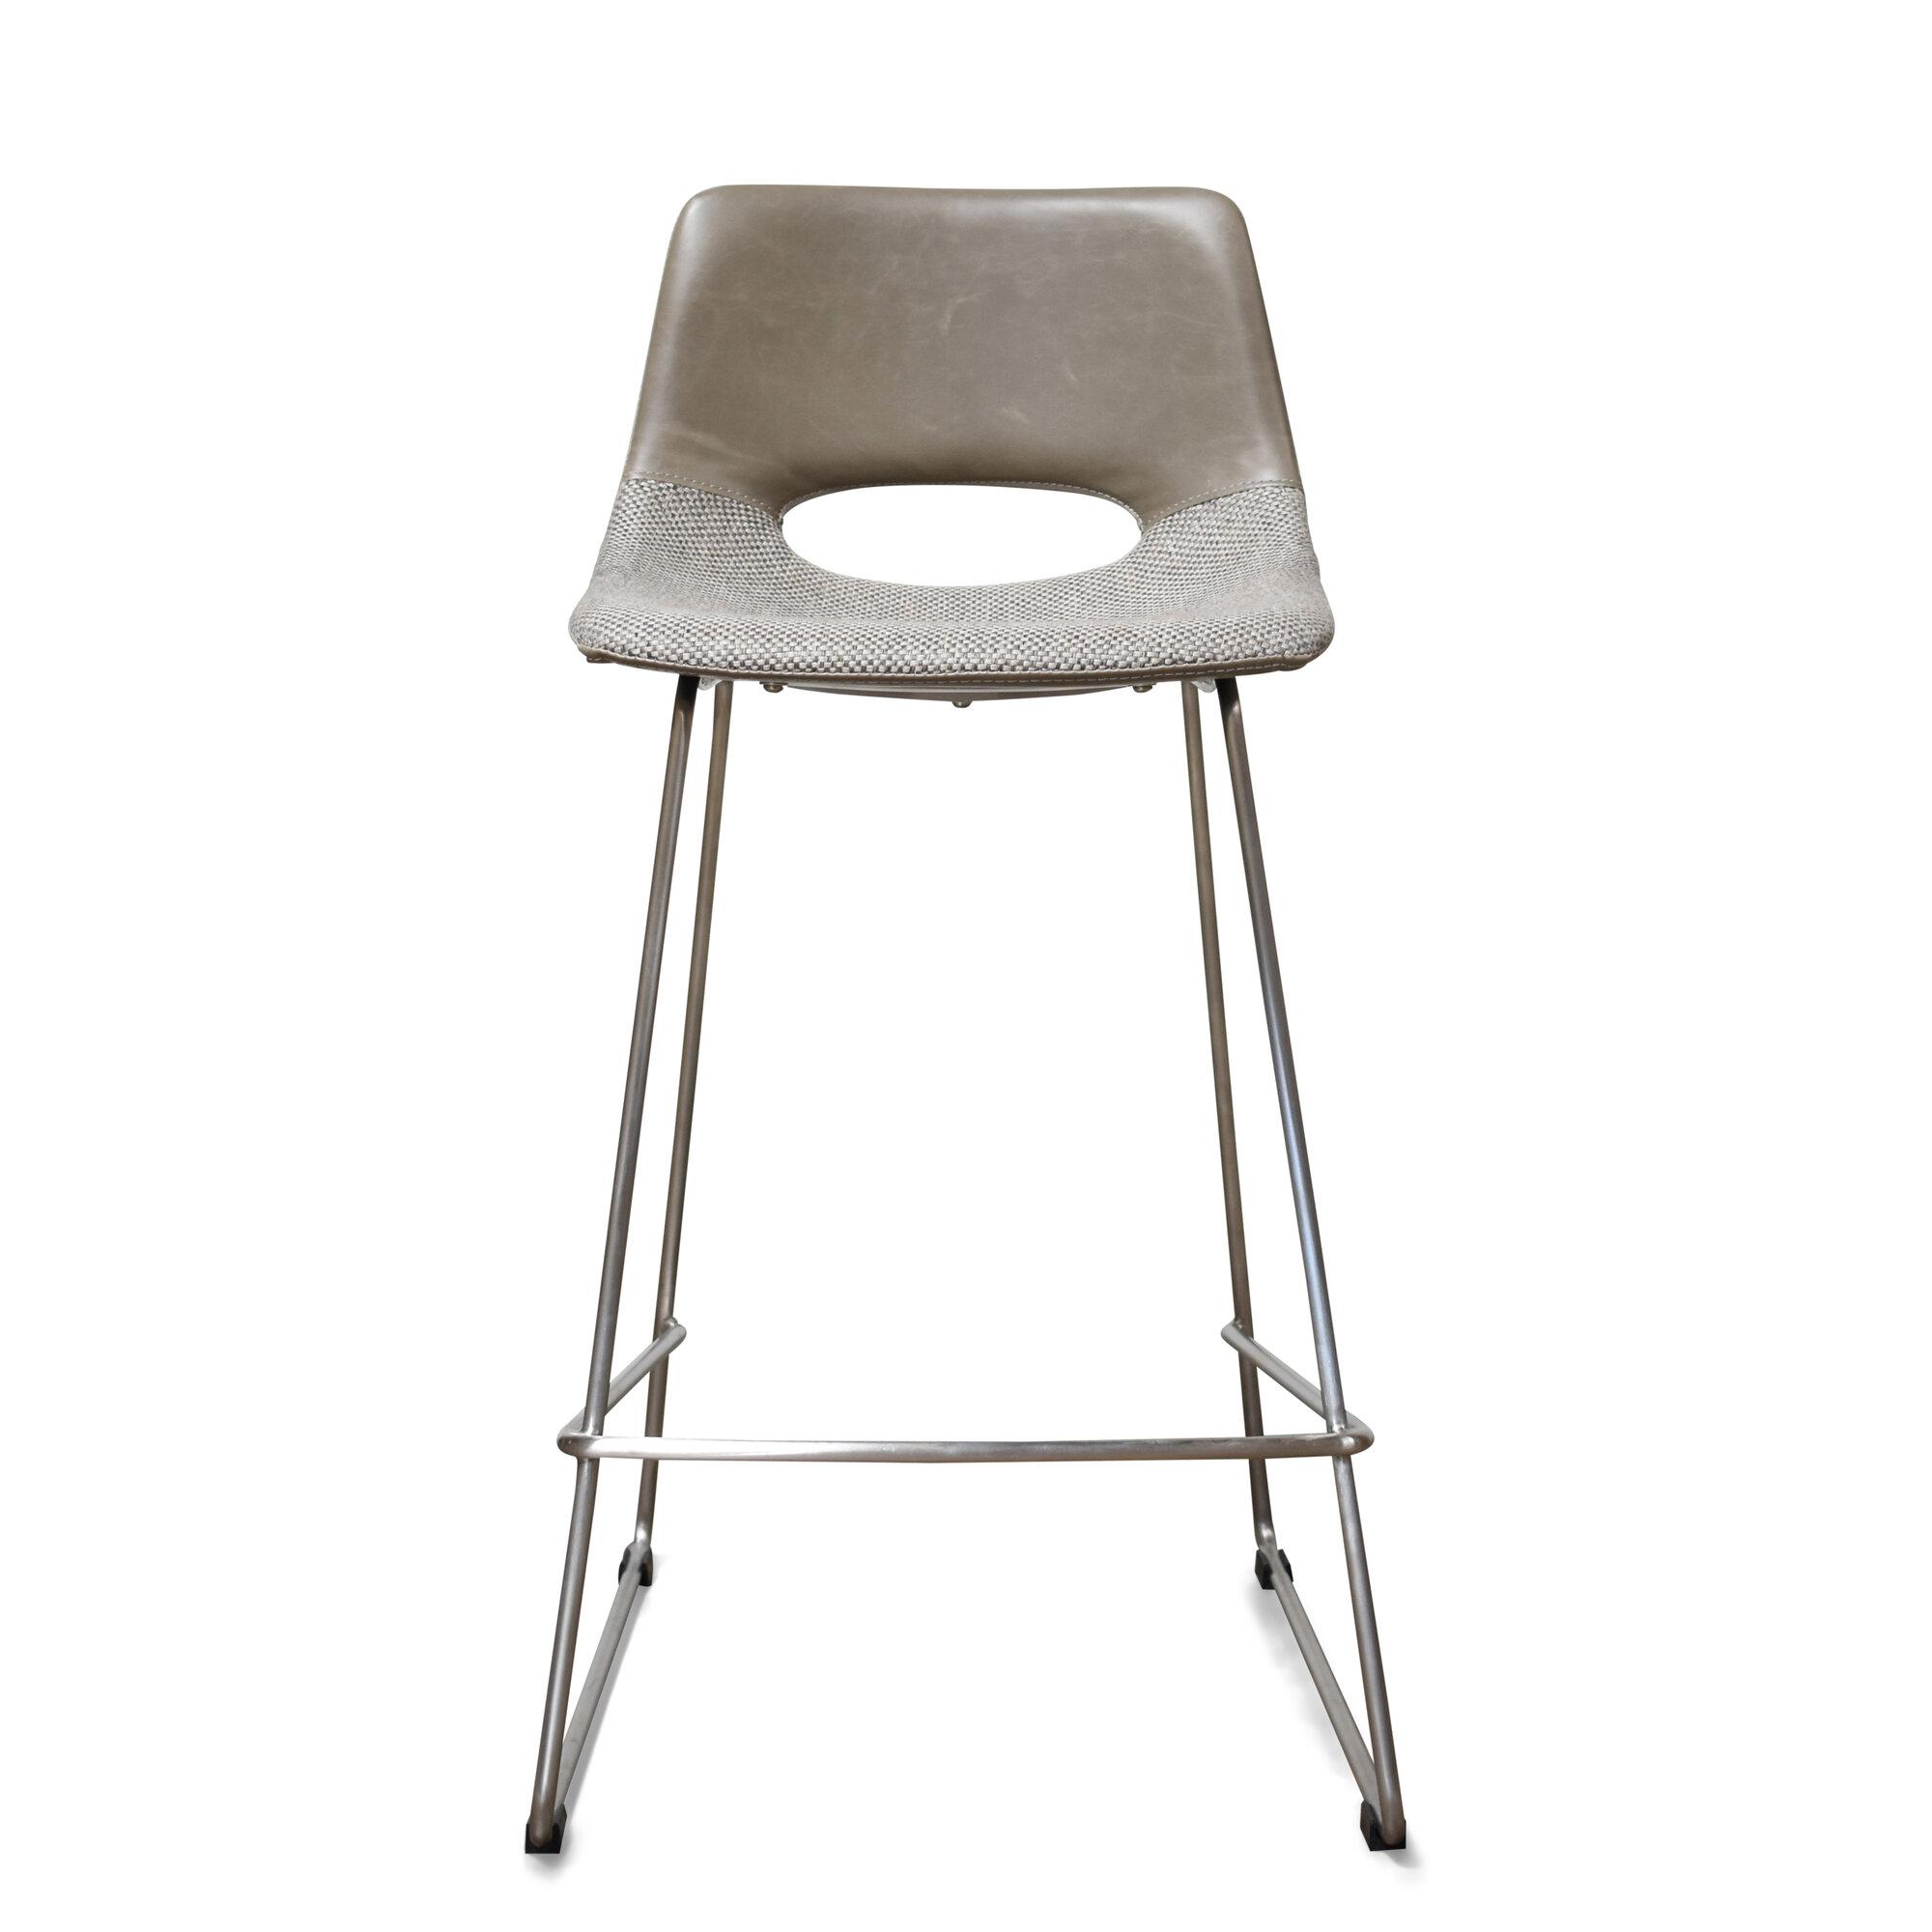 Tremendous Details About Brayden Studio Erwin 26 Bar Stool Set Of 2 Evergreenethics Interior Chair Design Evergreenethicsorg